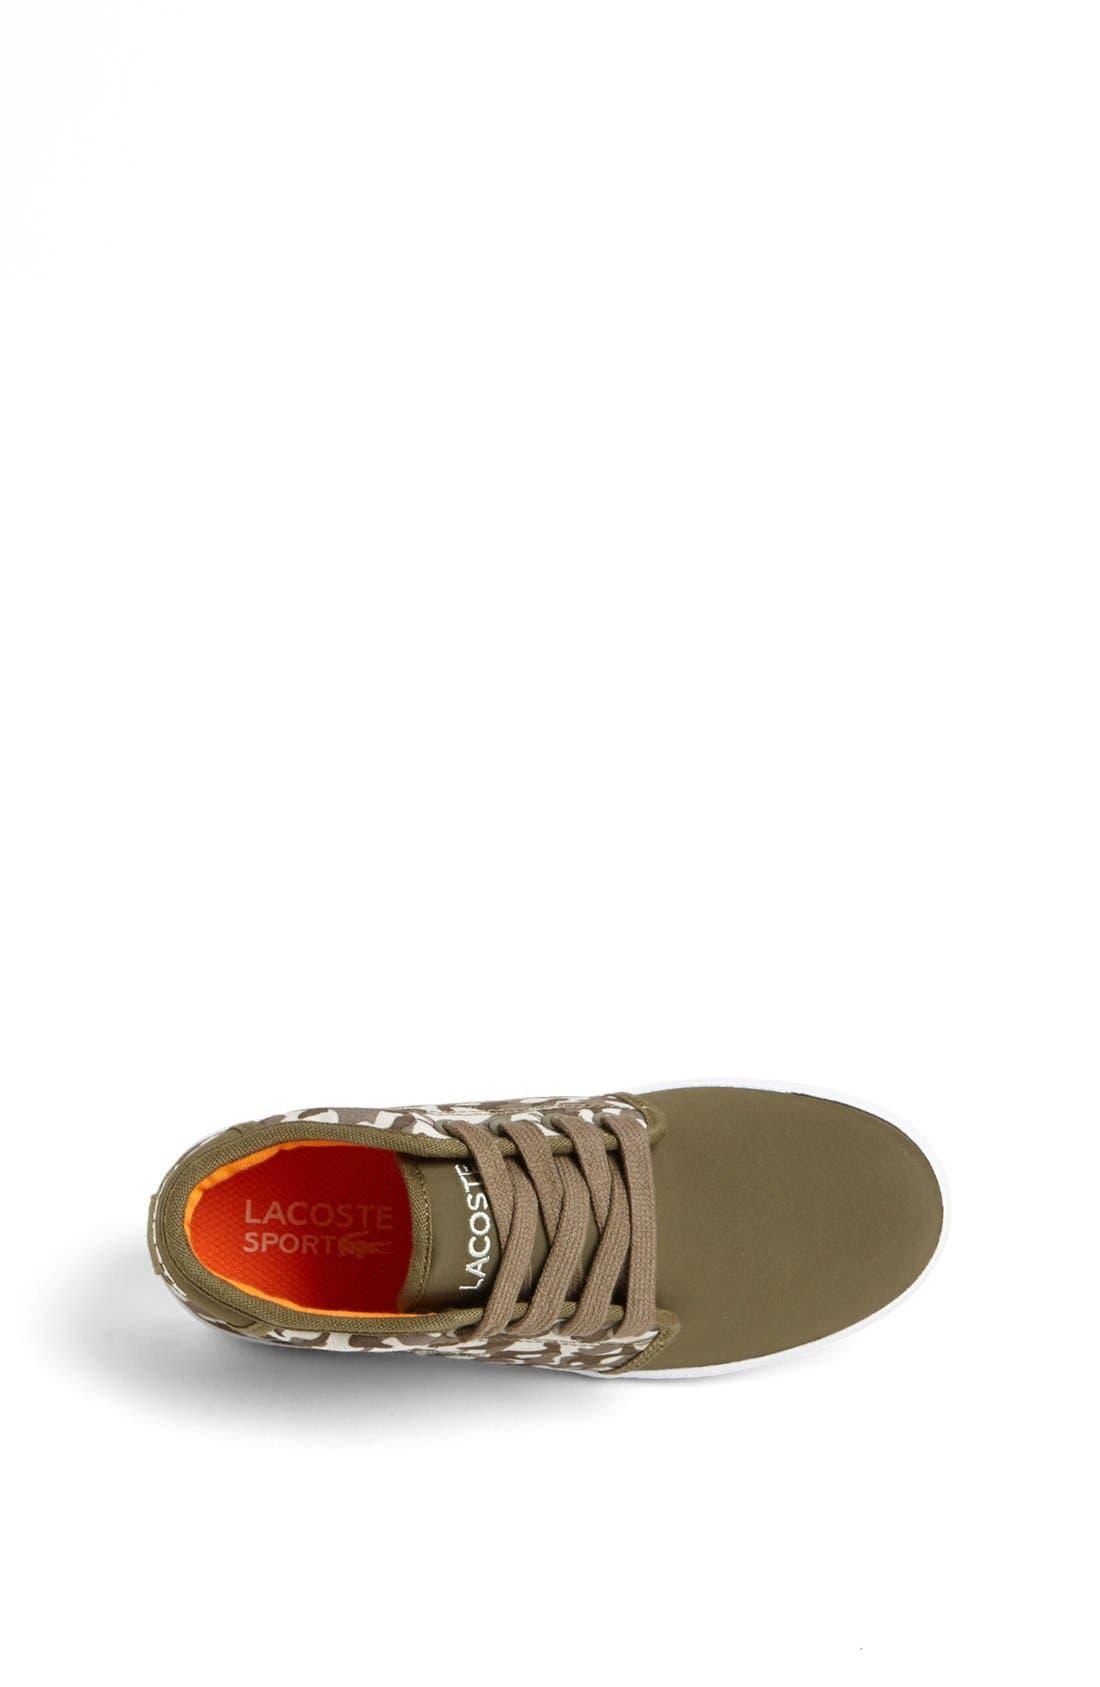 Alternate Image 3  - Lacoste 'Ampthill' Sneaker (Baby, Walker, Toddler, Little Kid & Big Kid)